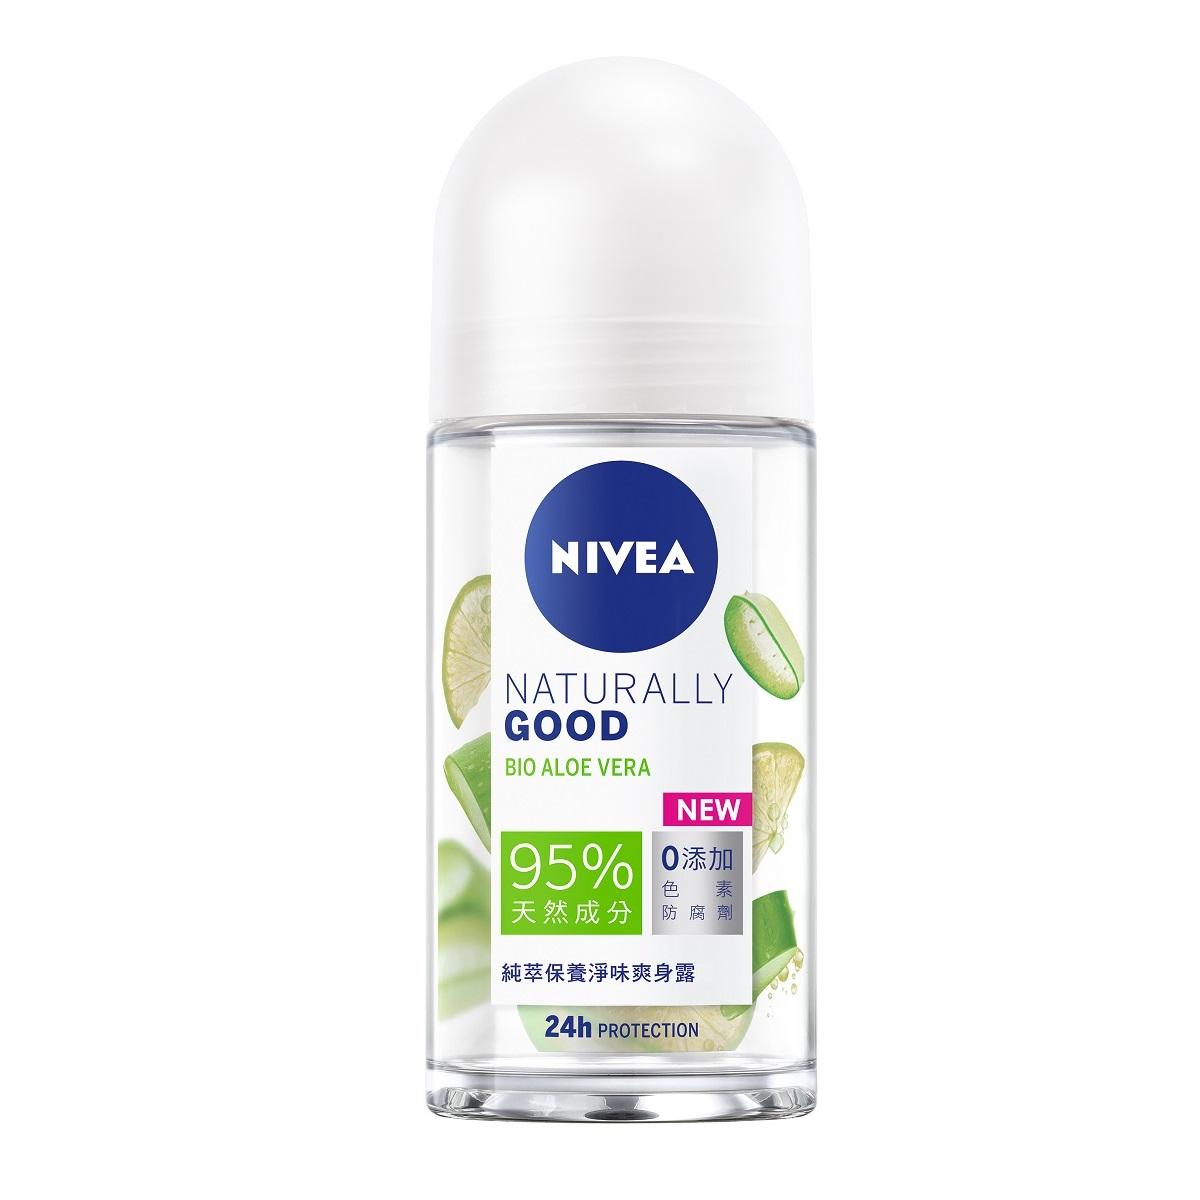 NIVEA妮維雅純萃保養淨味爽身露天然有機蘆薈50ml 【康是美】